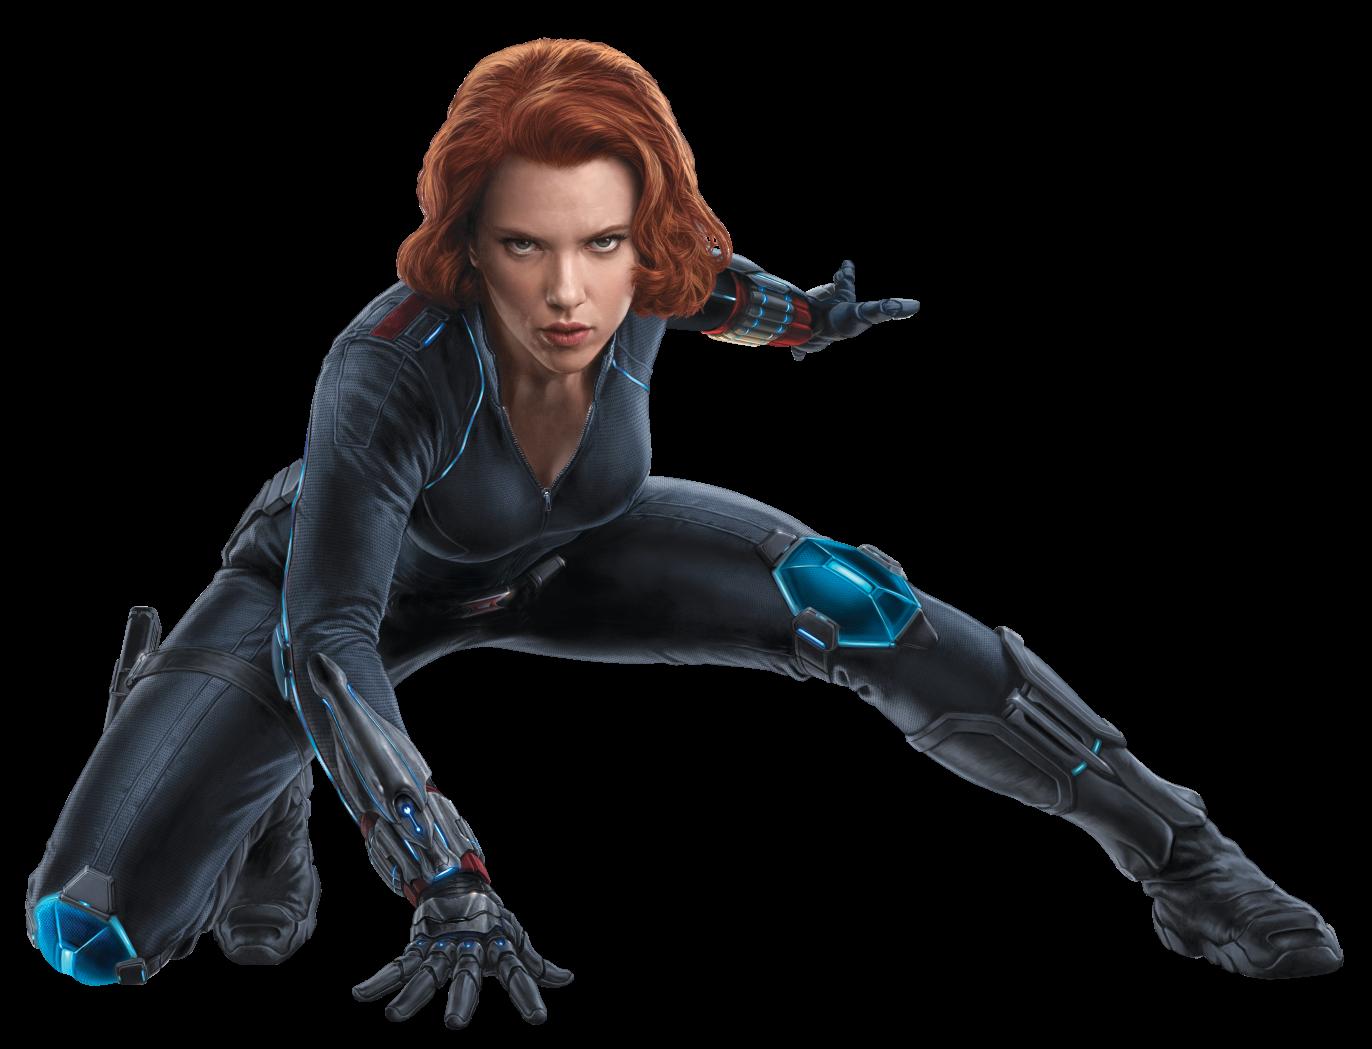 Avengers Pinterest: BlackWidow_AOU.png